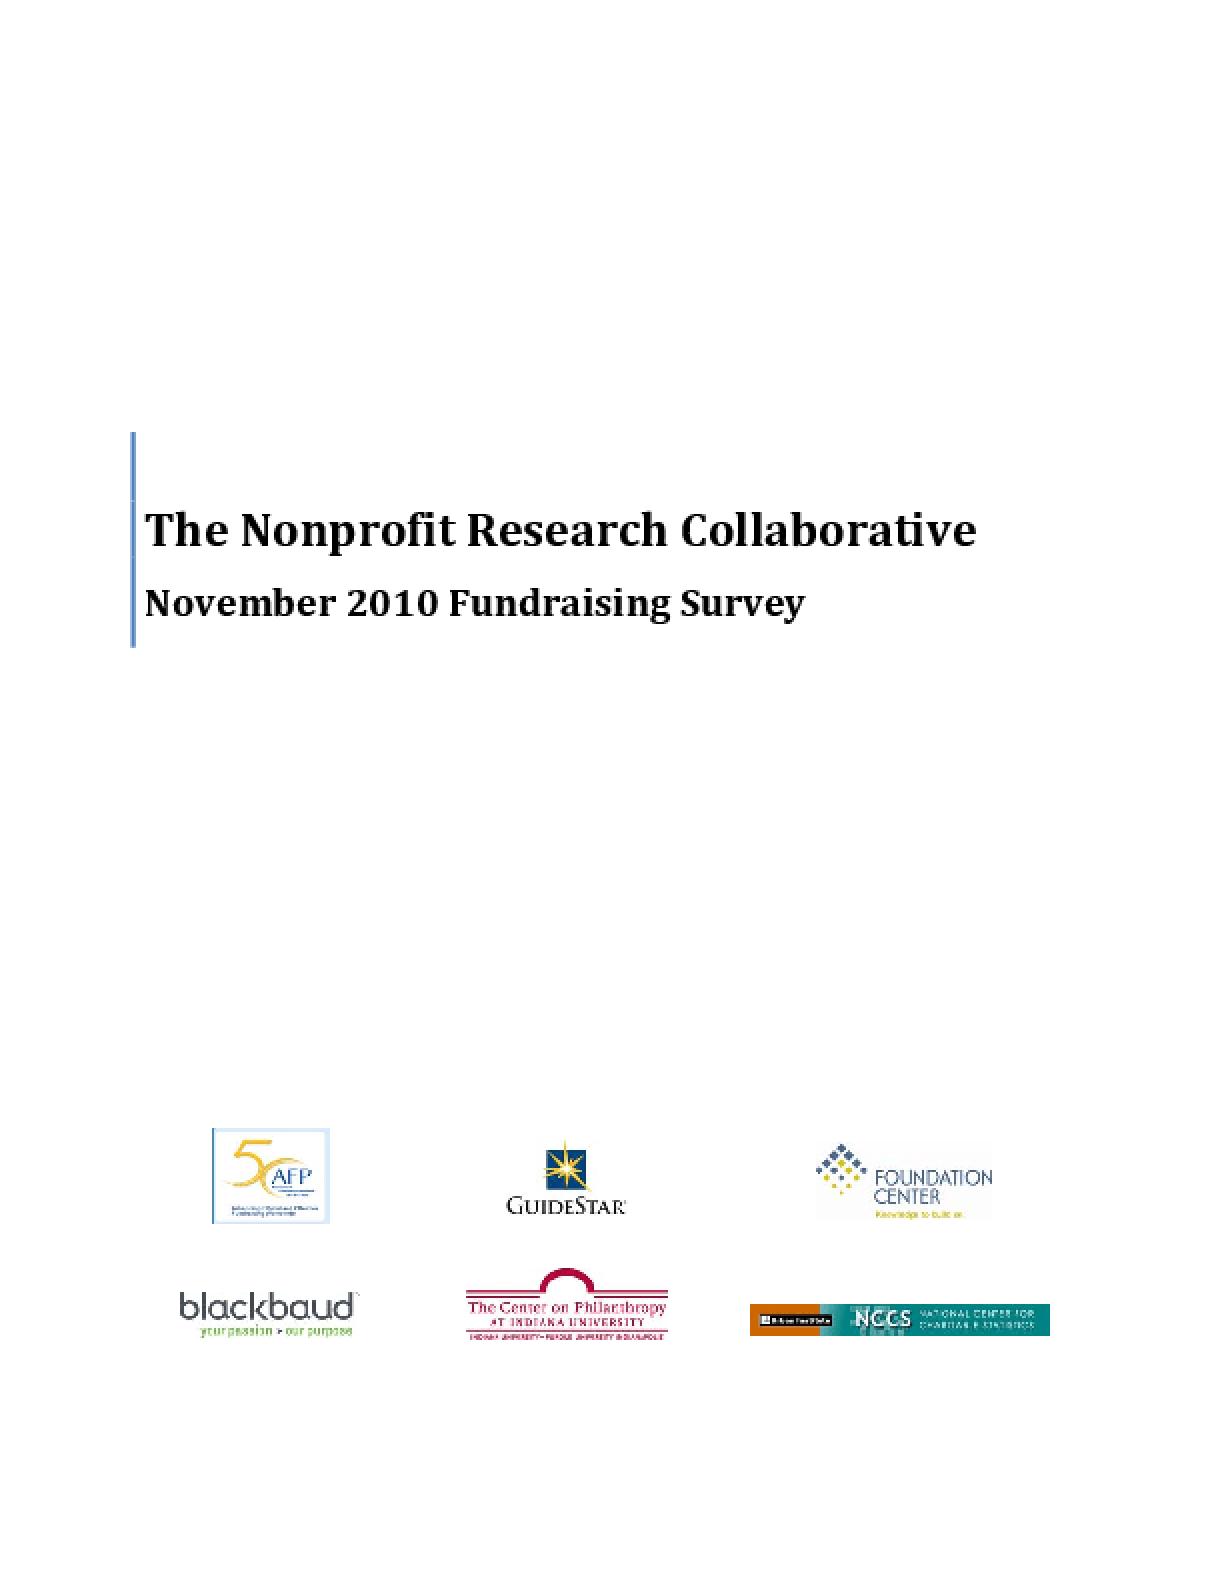 The Nonprofit Research Collaborative: November 2010 Fundraising Survey